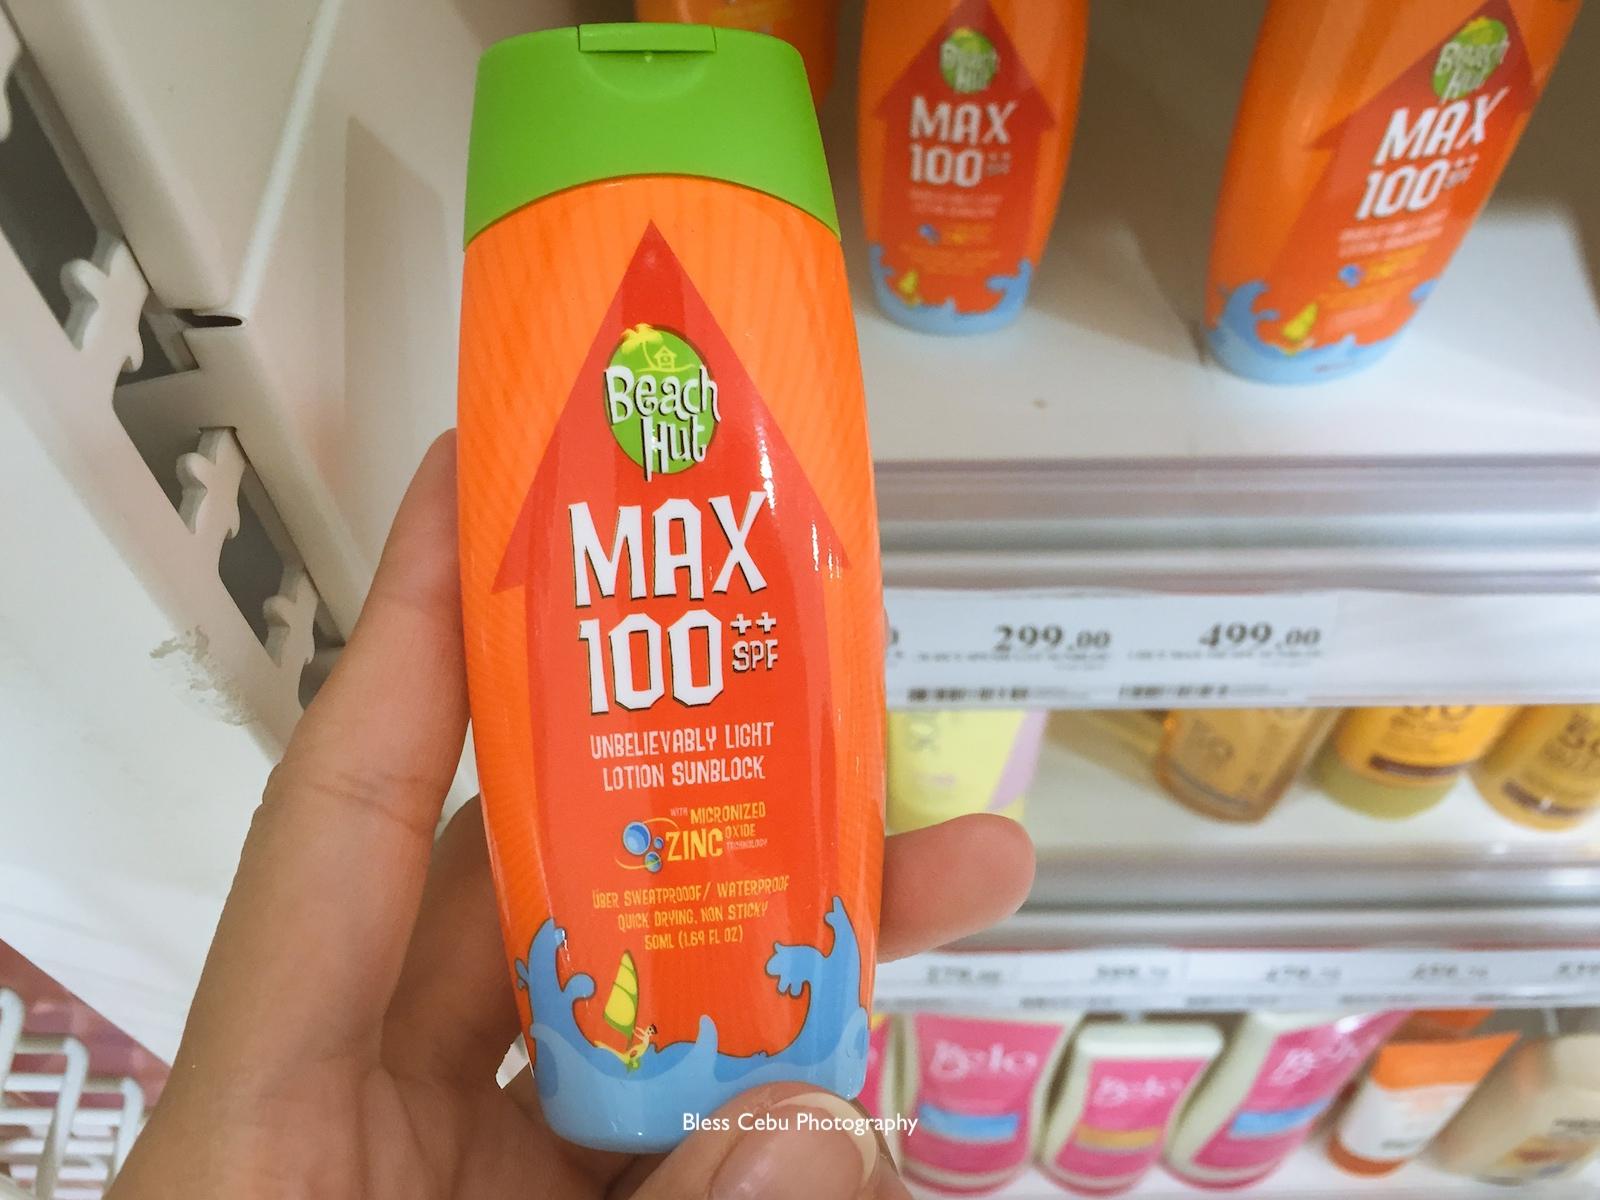 Beach Mut MAX100++